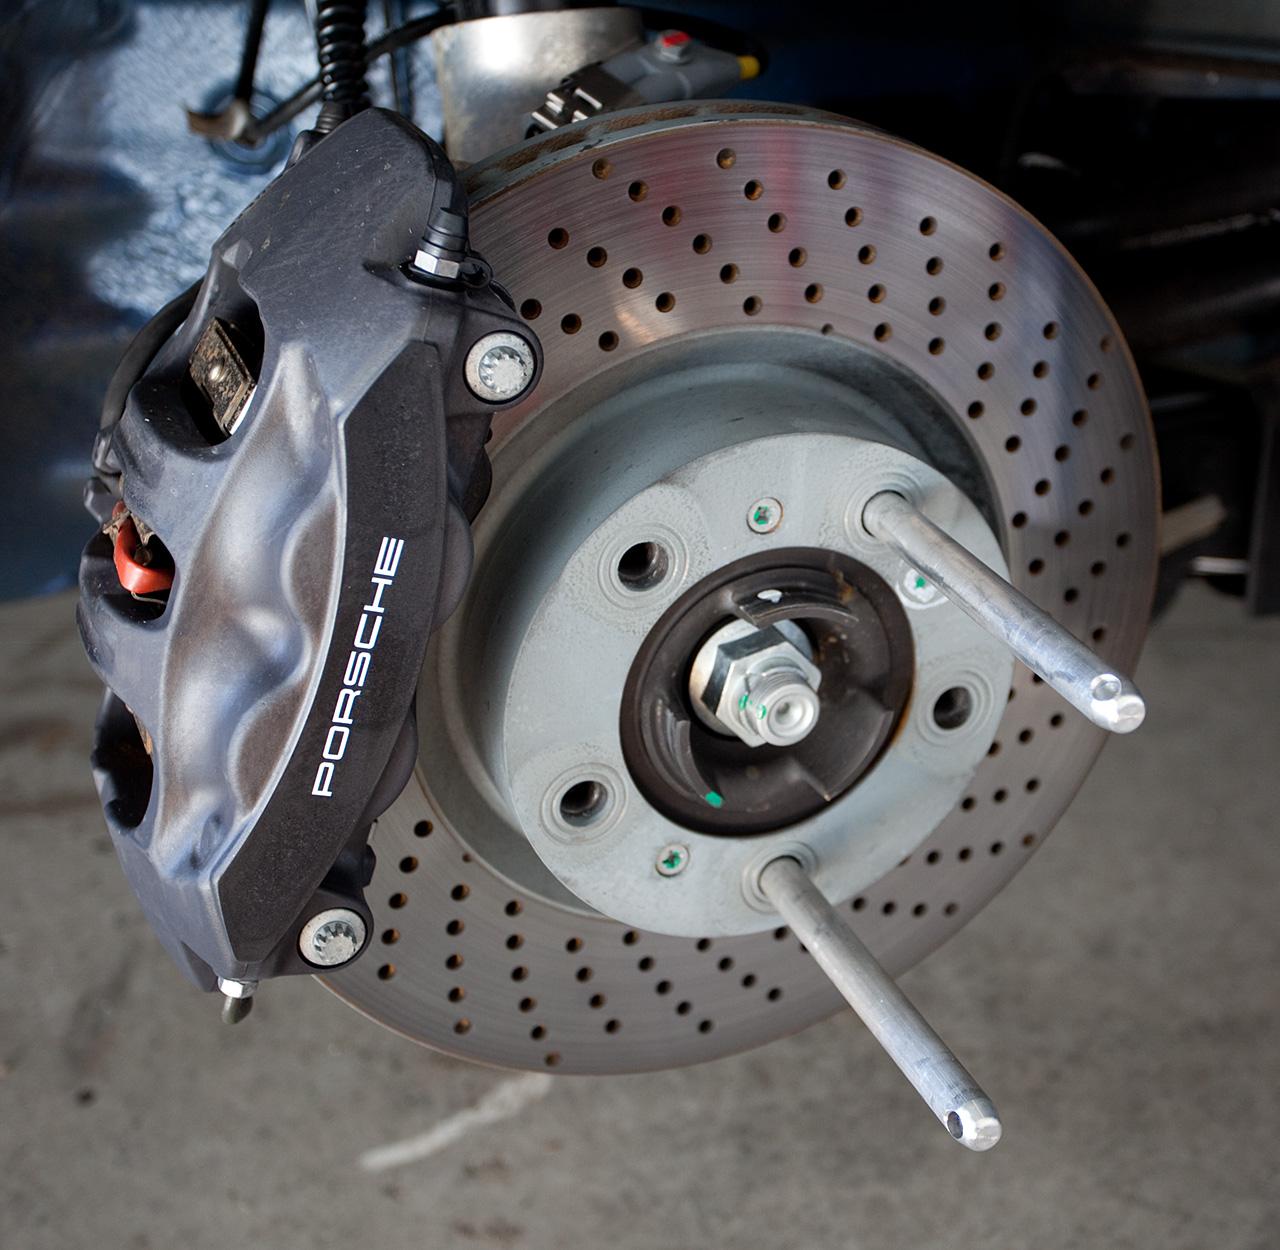 Porsche 997 C2s Engine Problems: 2009 C2 Vs C2S Brake Rotors